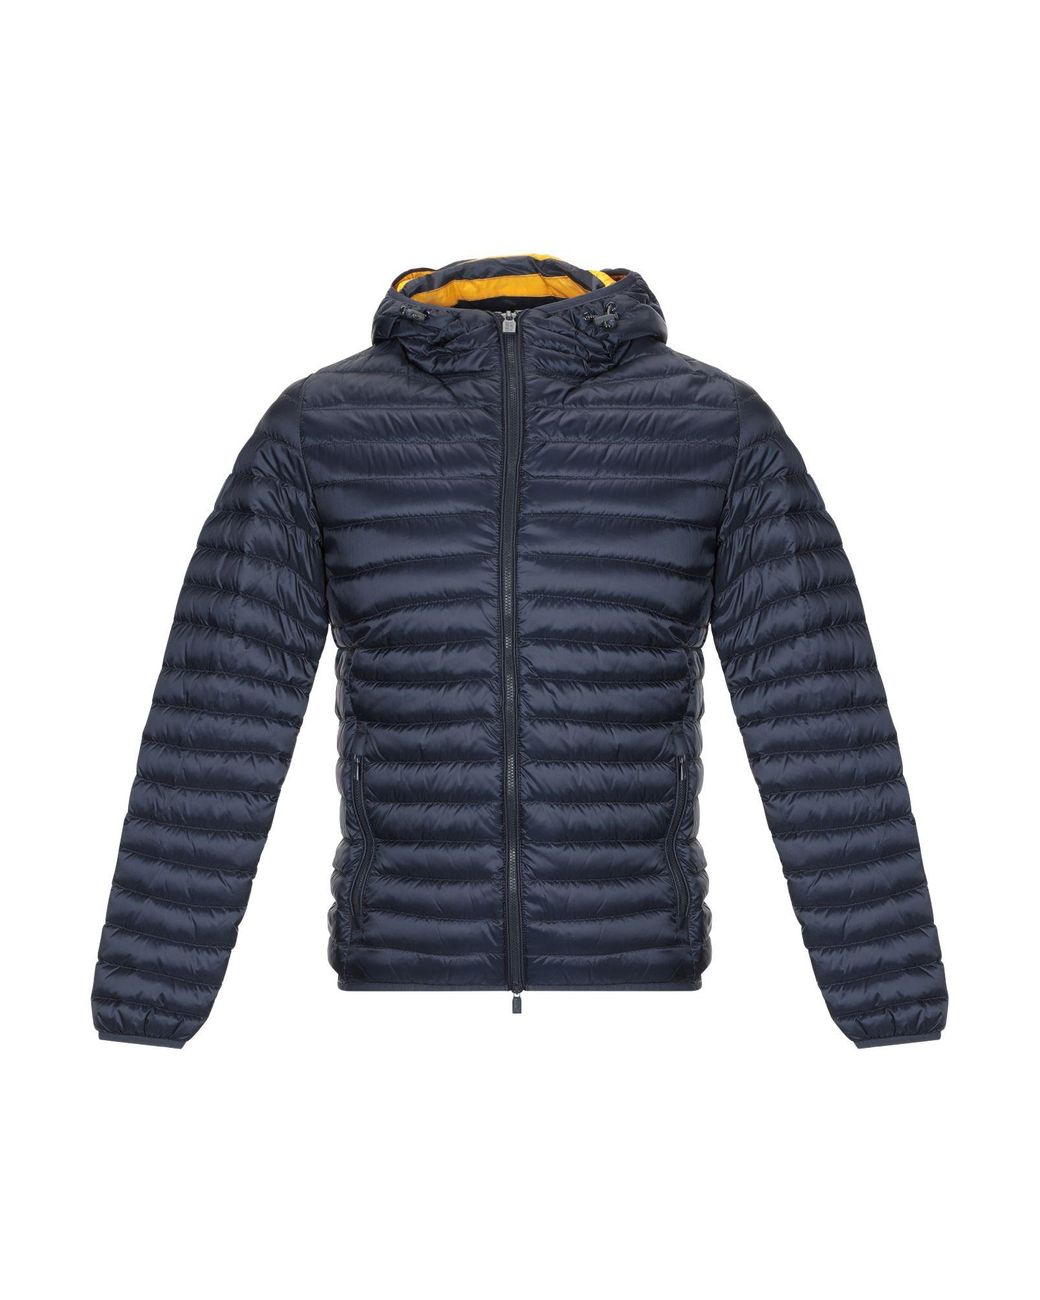 release date: bea23 7887d Ciesse Piumini Down Jacket in Blue for Men - Lyst